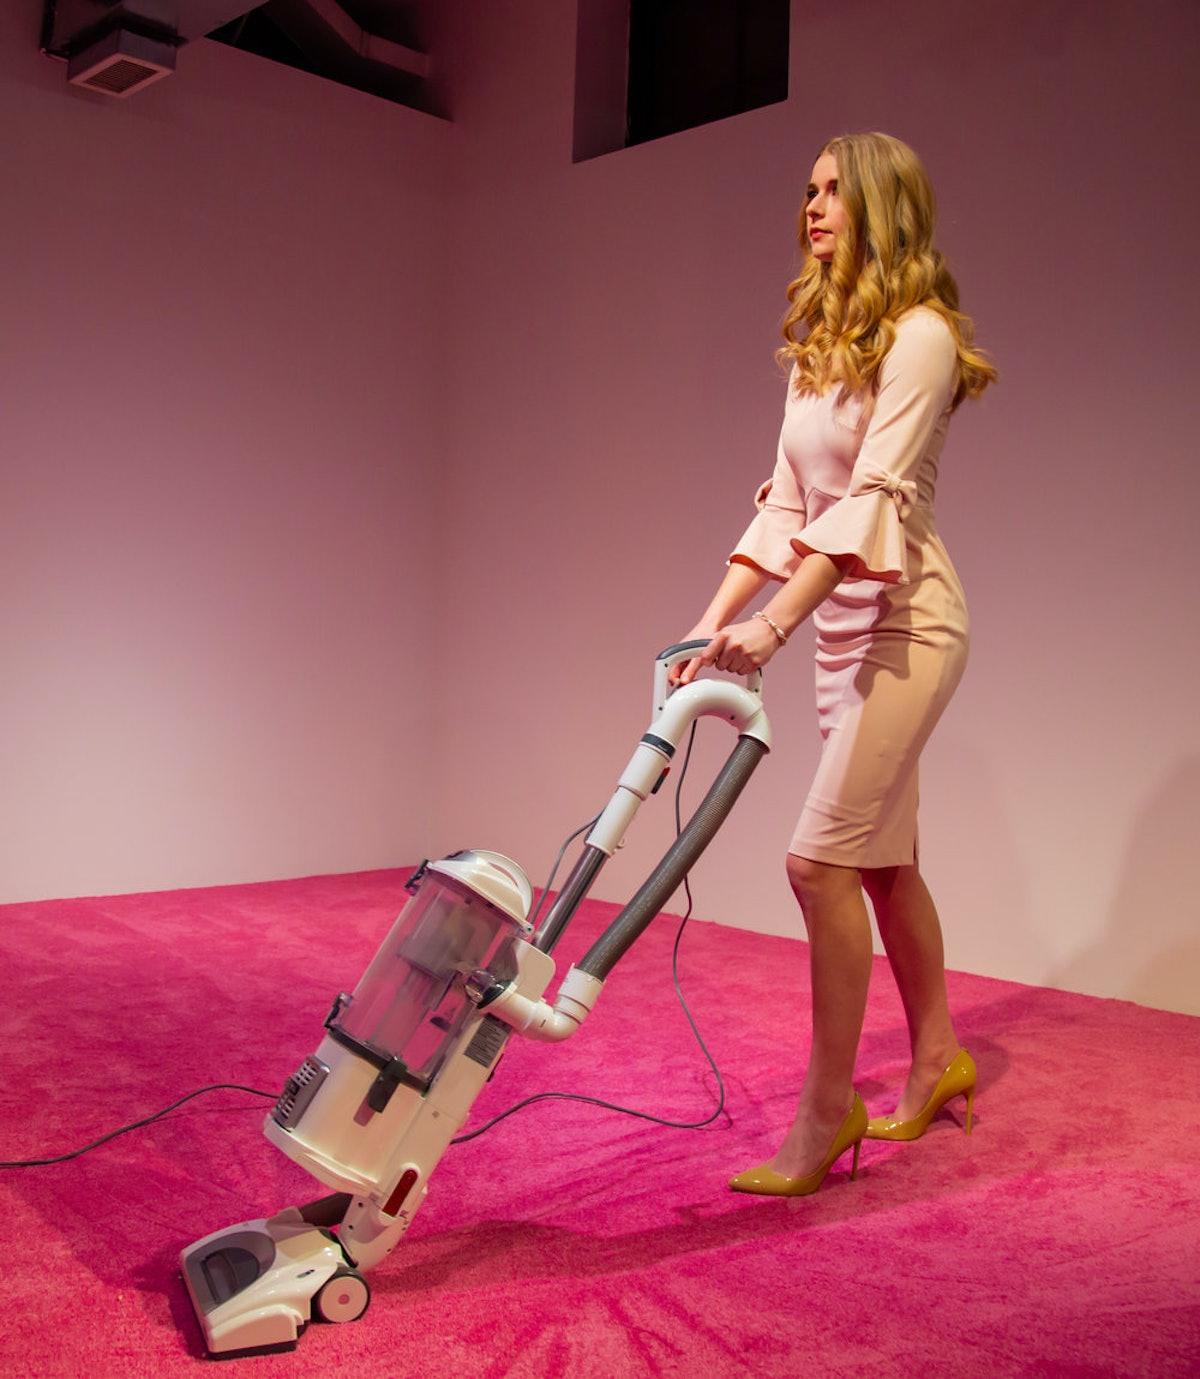 ivanka-vacuuming-3.jpg